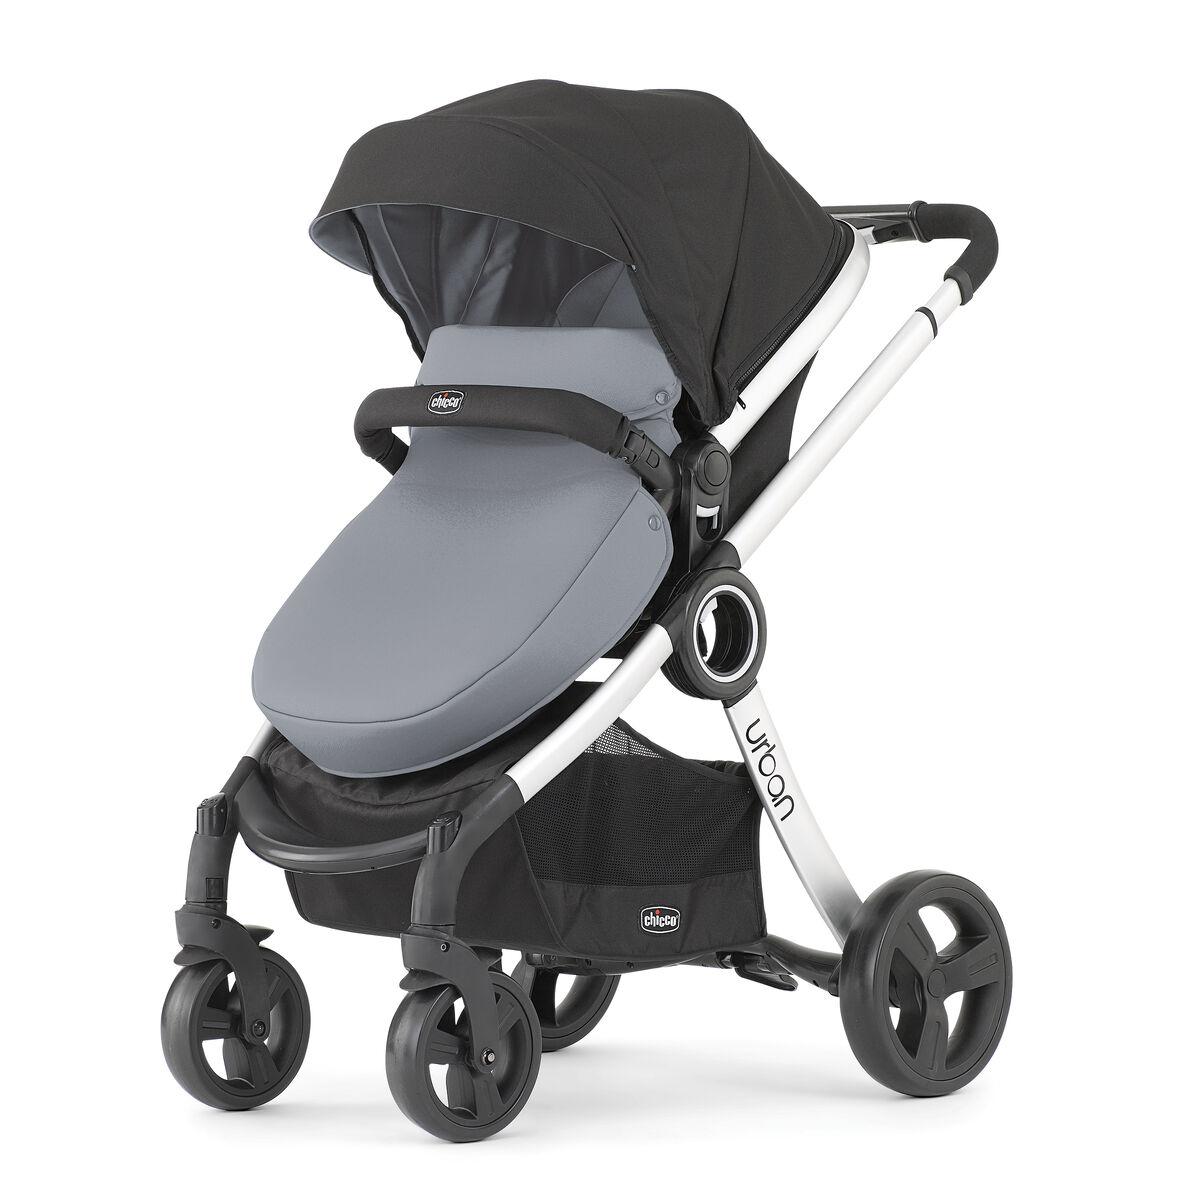 baby gear  baby strollers  chicco stroller - urban  in  modular stroller  coal